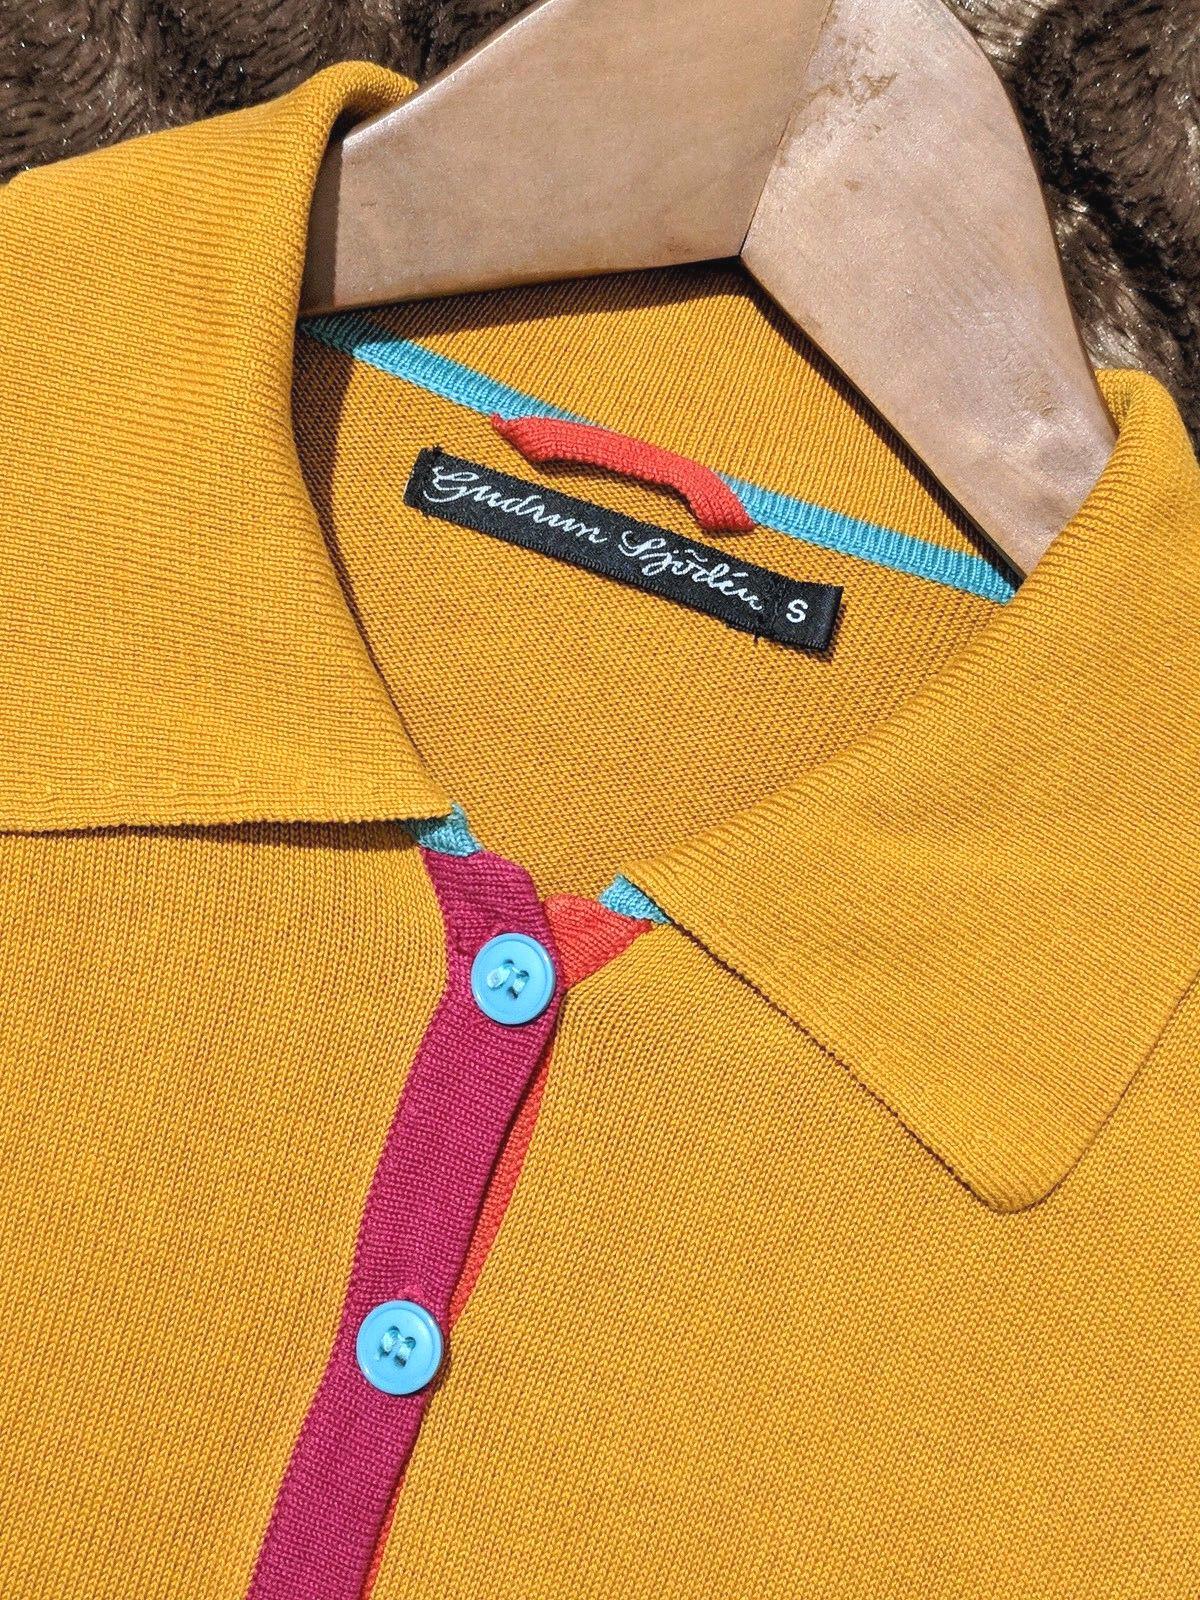 Gudrun Sjoden S Silk Cotton Blend Cardigan Knit Mustard Yellow Collar Button